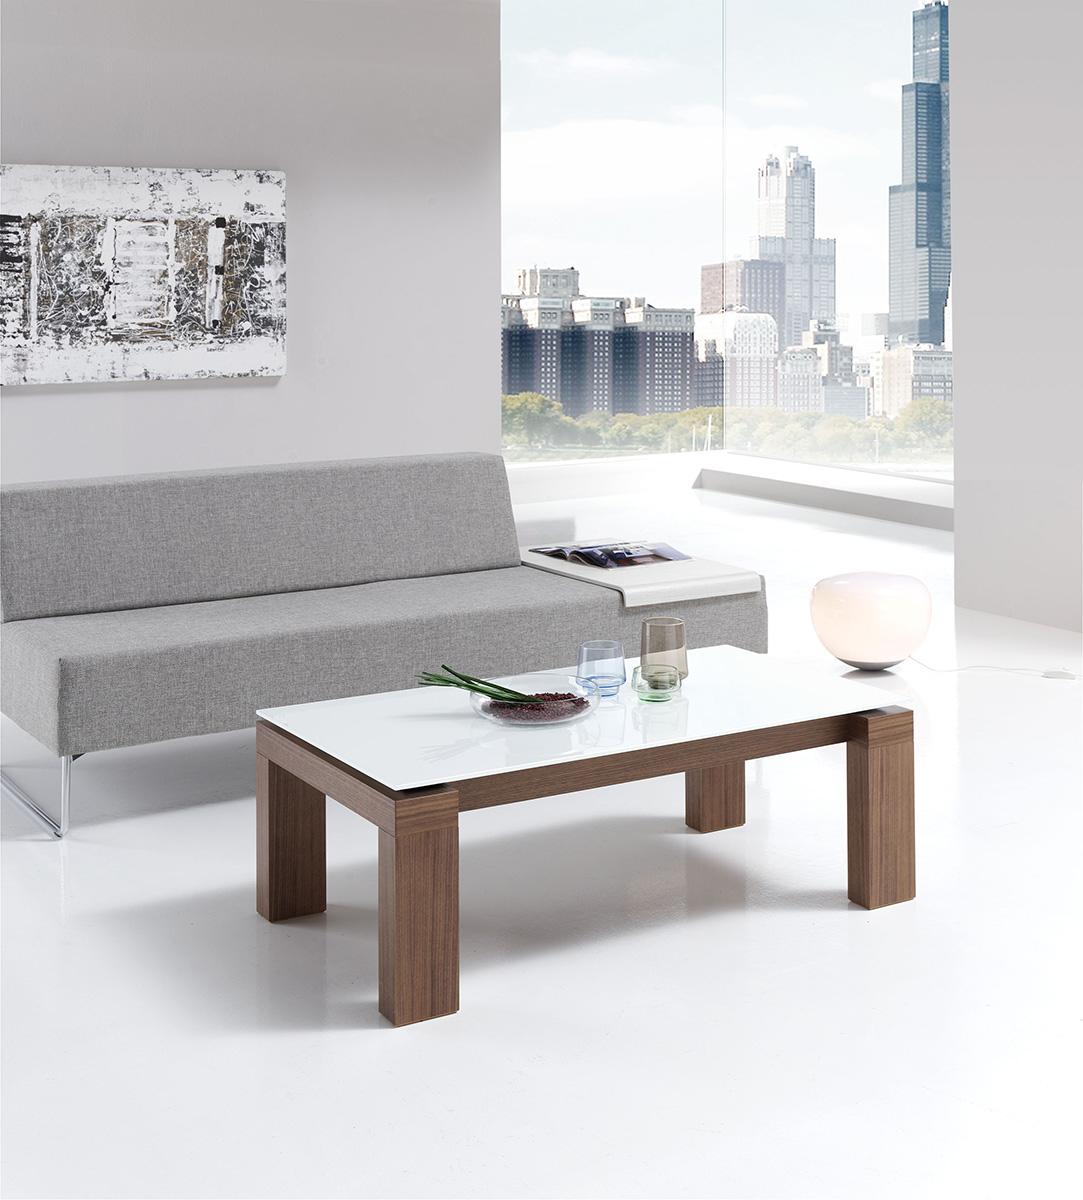 mesas-de-centro-General-muebles-paco-caballero-0033-5ccc2577e2d5d